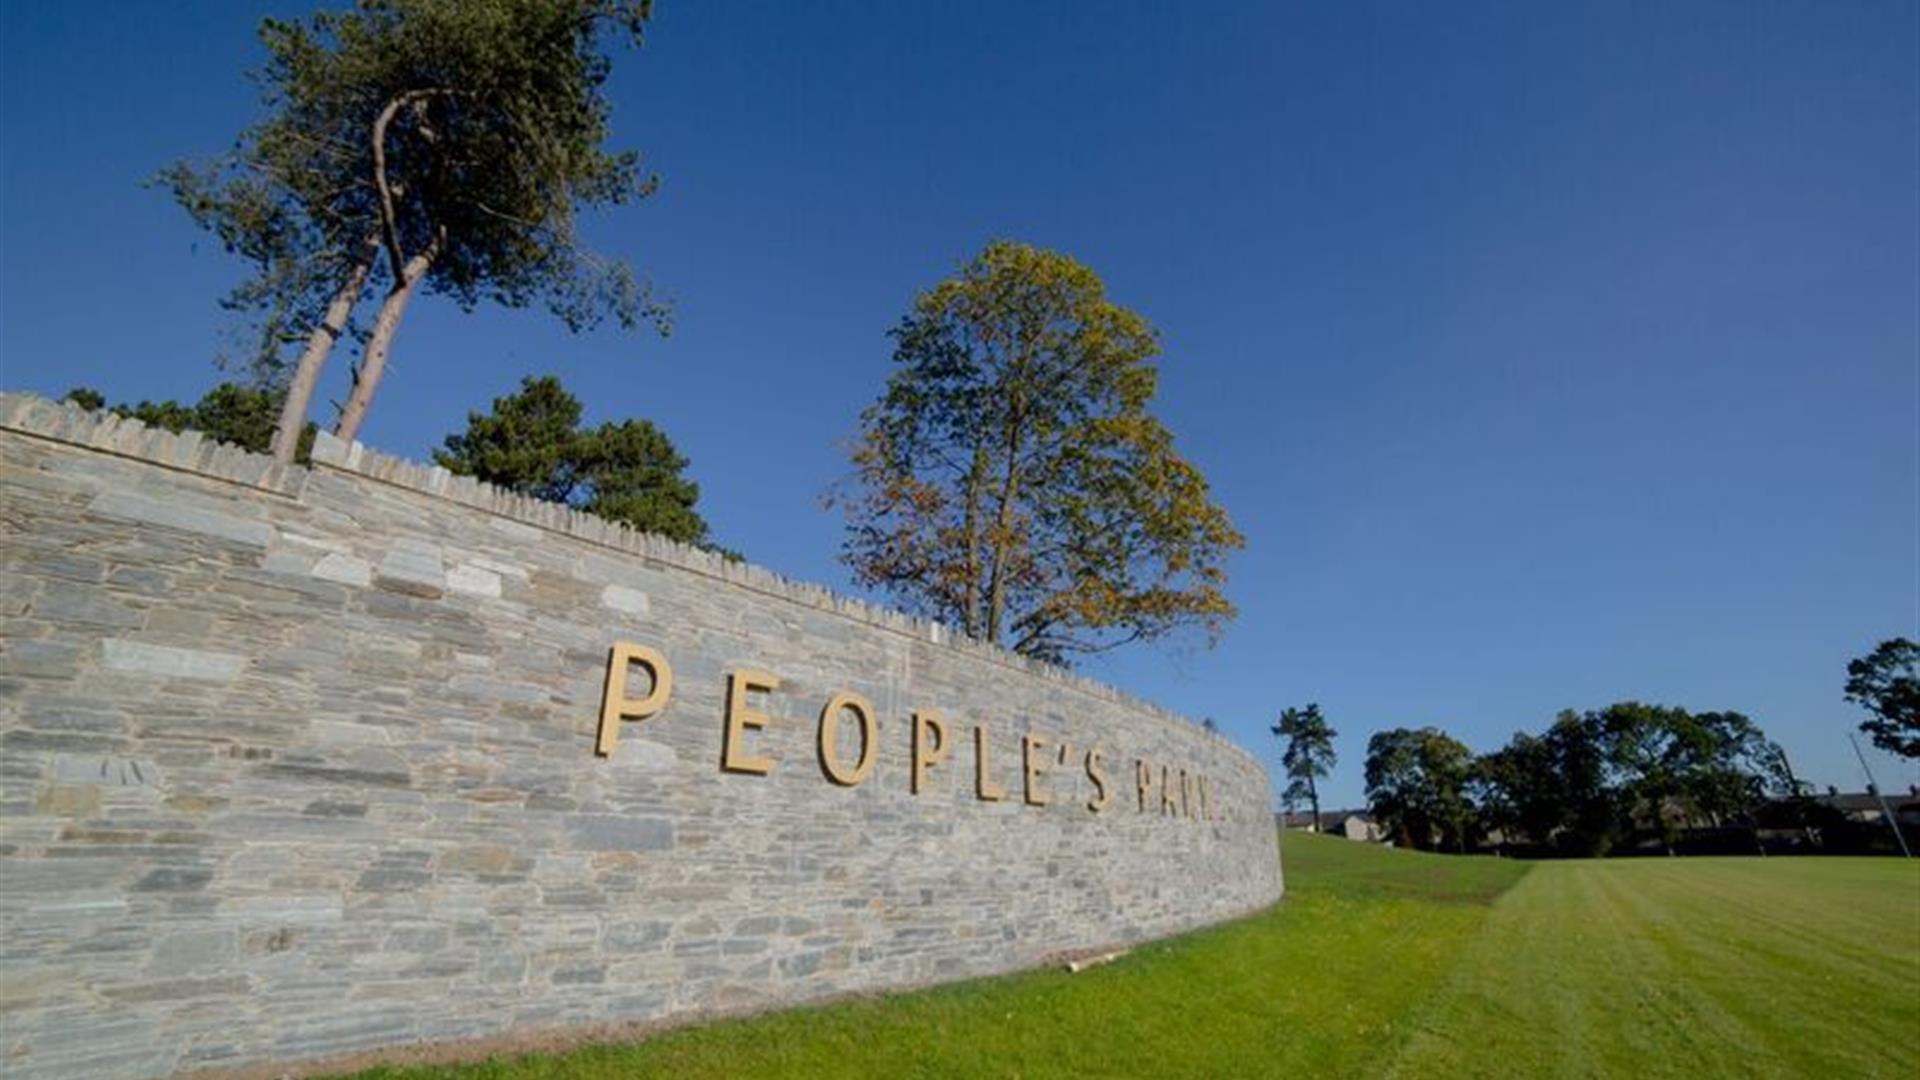 Portadown People's Park